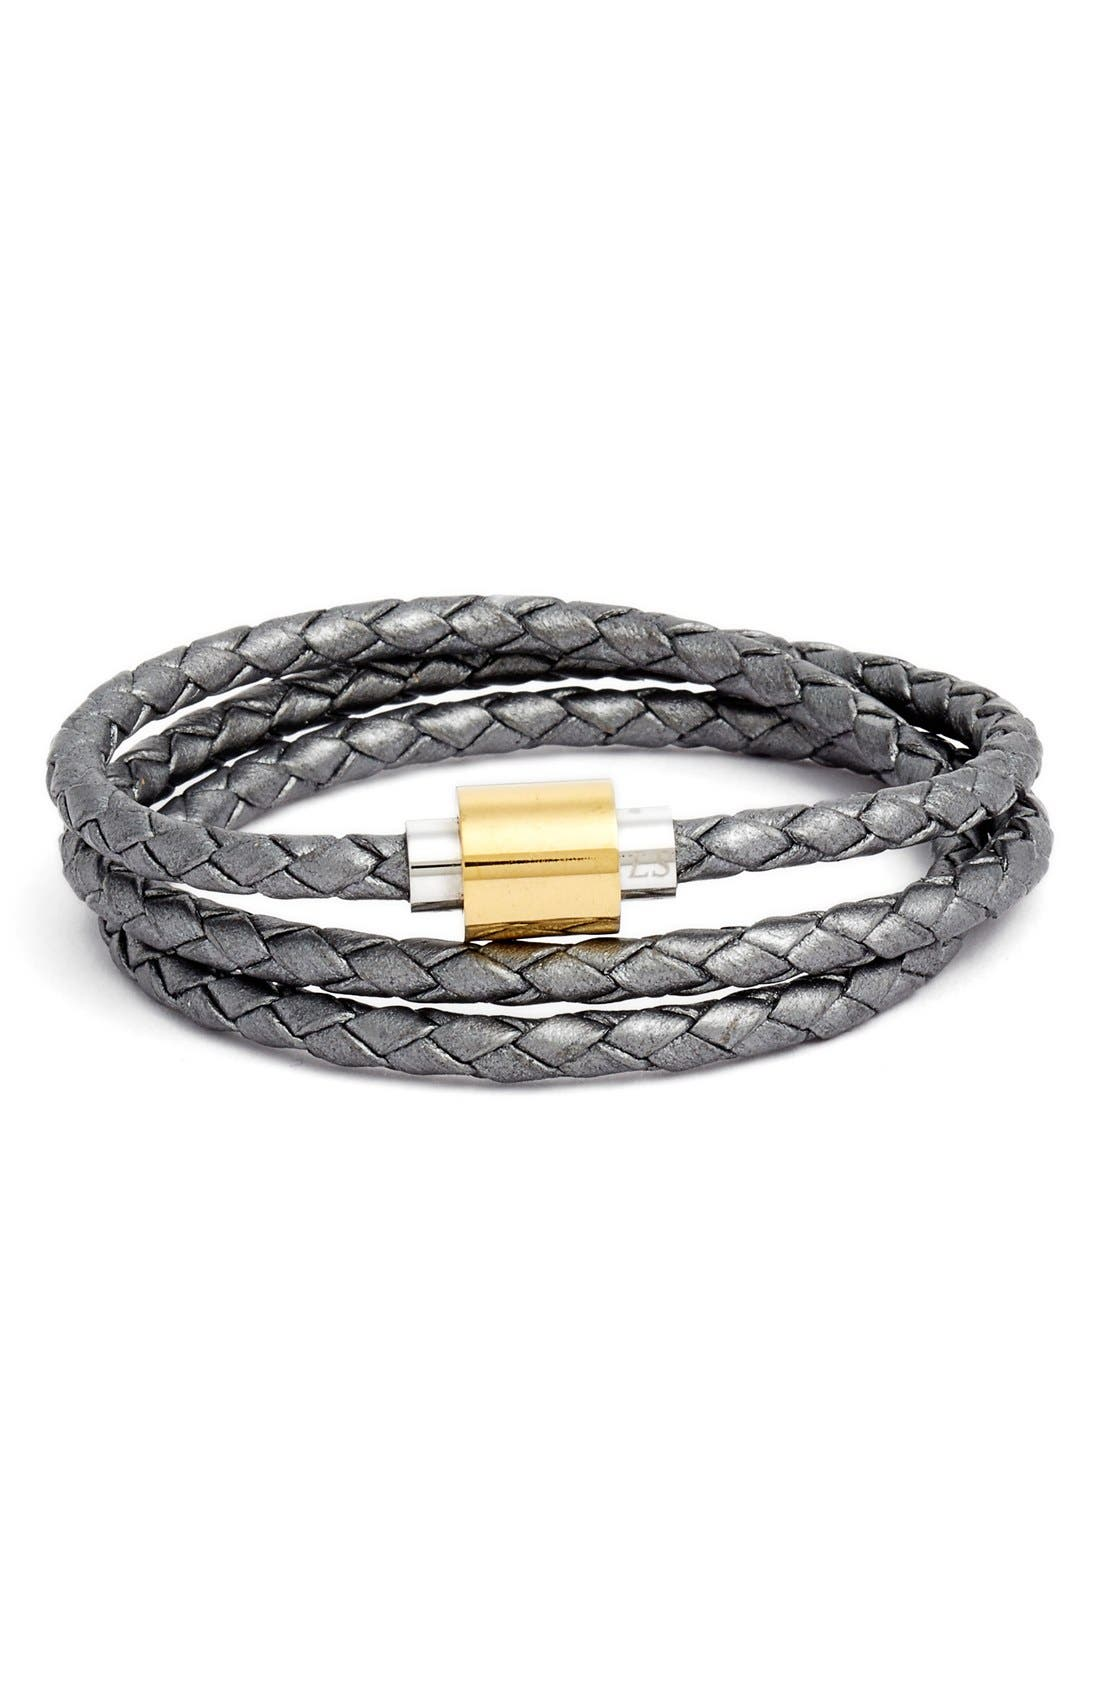 'SOBE Original' Braided Leather Wrap Bracelet,                         Main,                         color, Silver